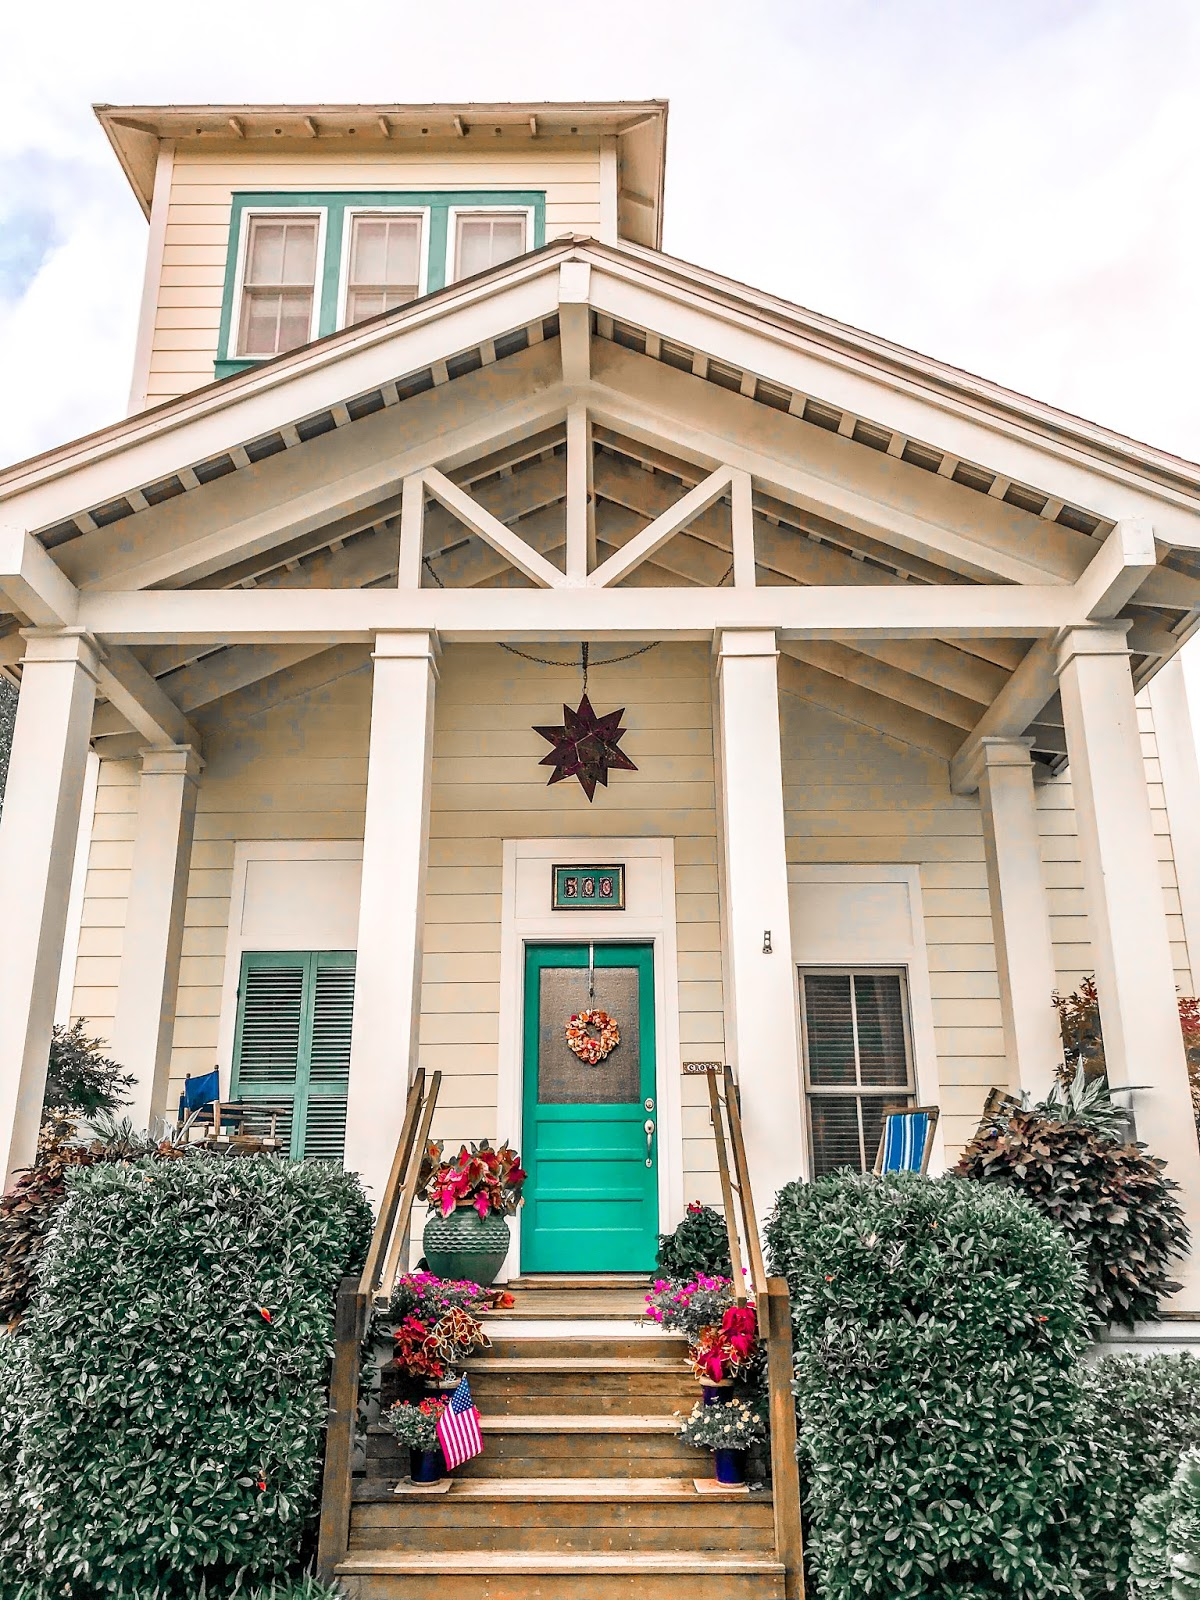 Seville Historic District in Pensacola, Fl